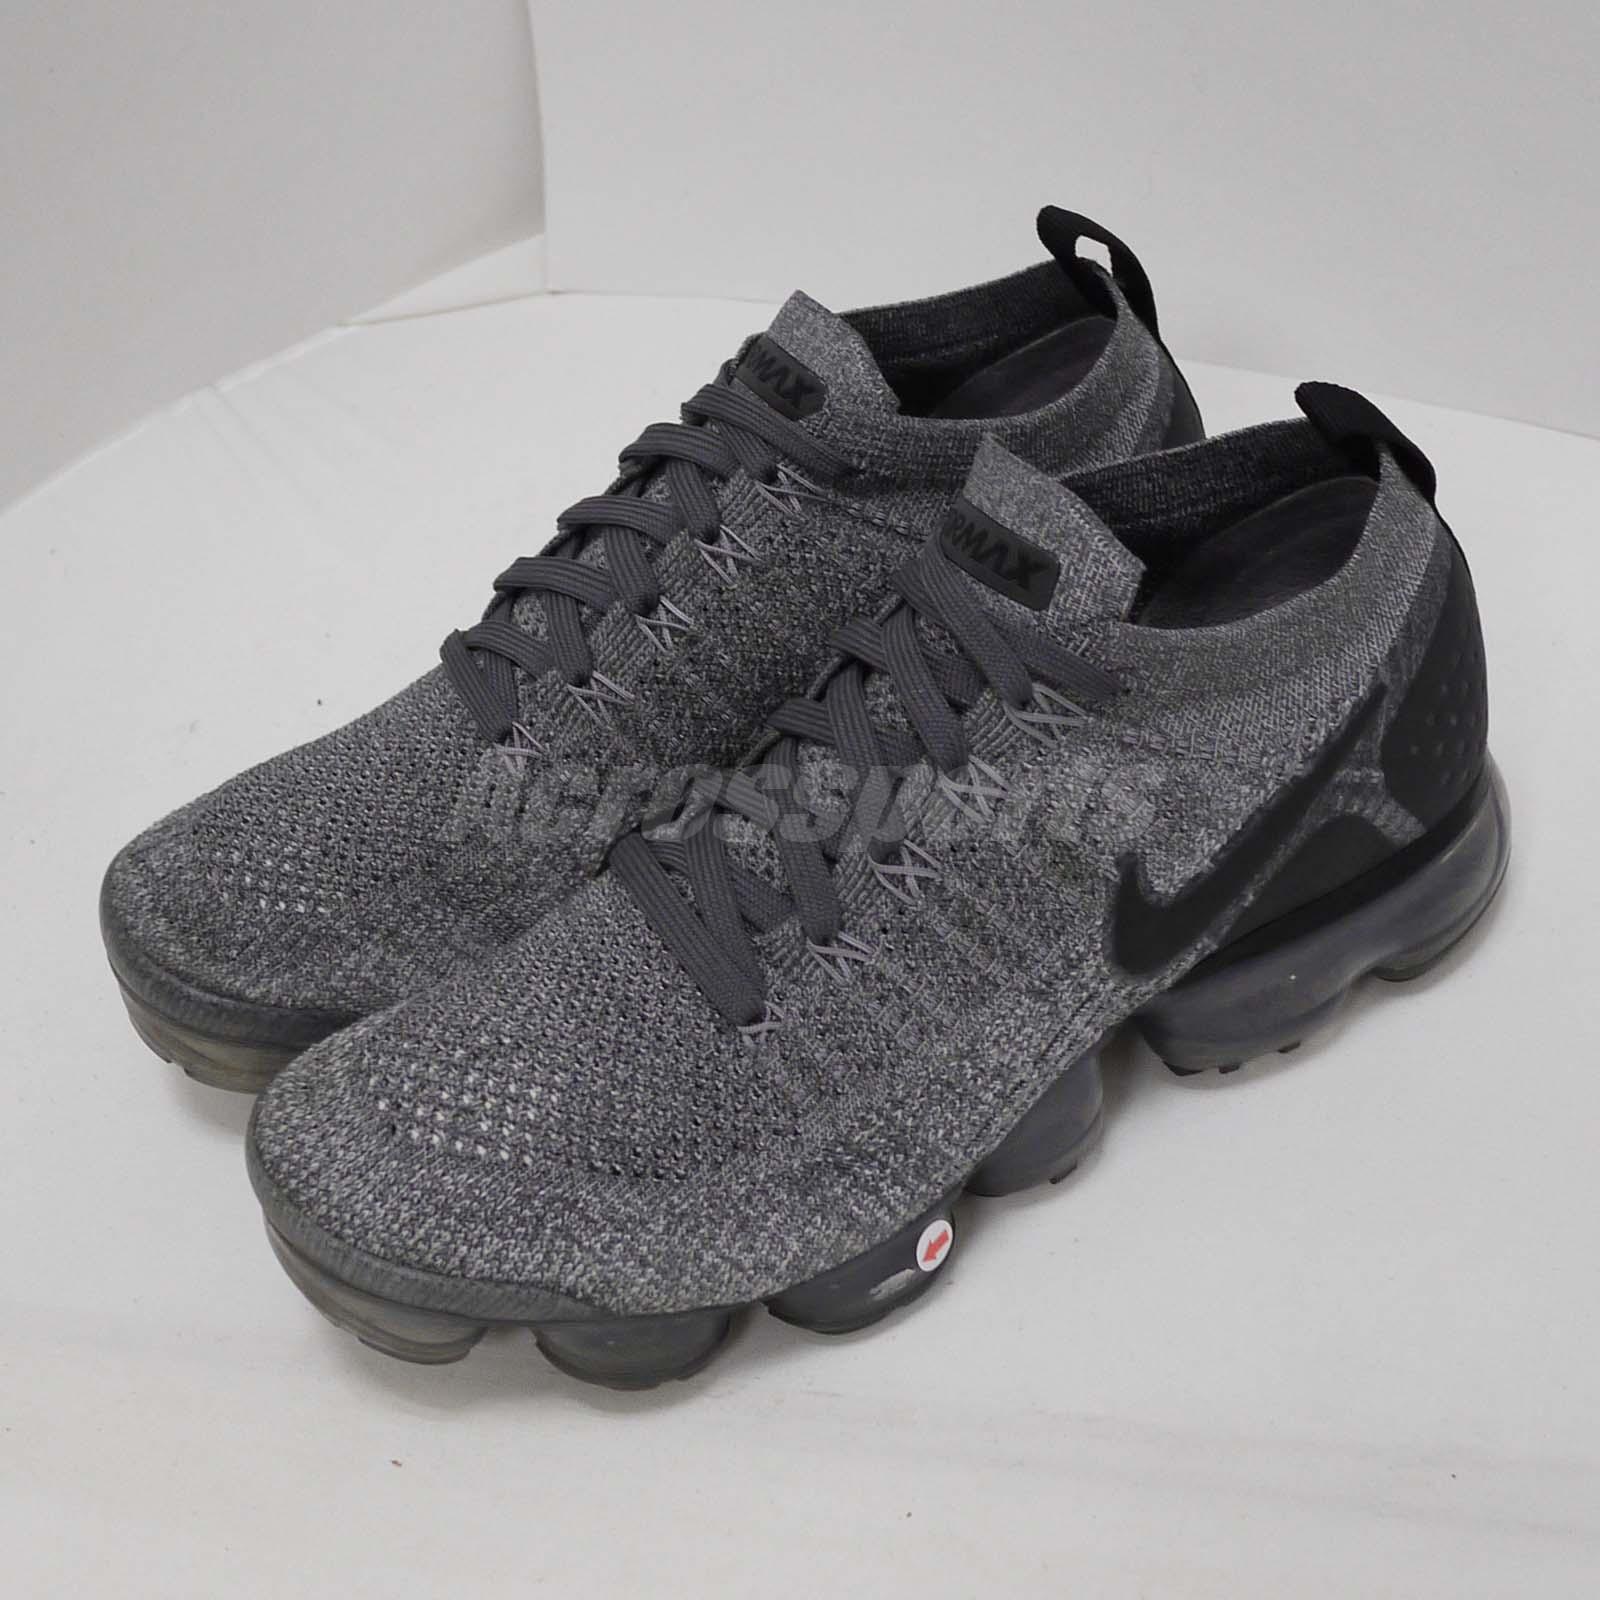 Nike Free Rn Flyknit 2 Wolf Grey Black W AUTHENTIC NWT